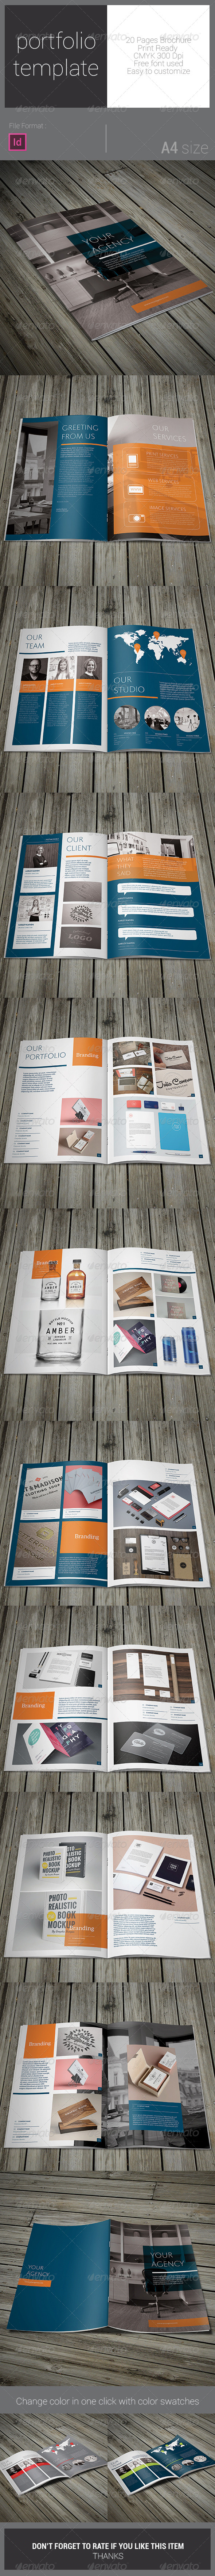 GraphicRiver Portfolio Brochure Template 7911259